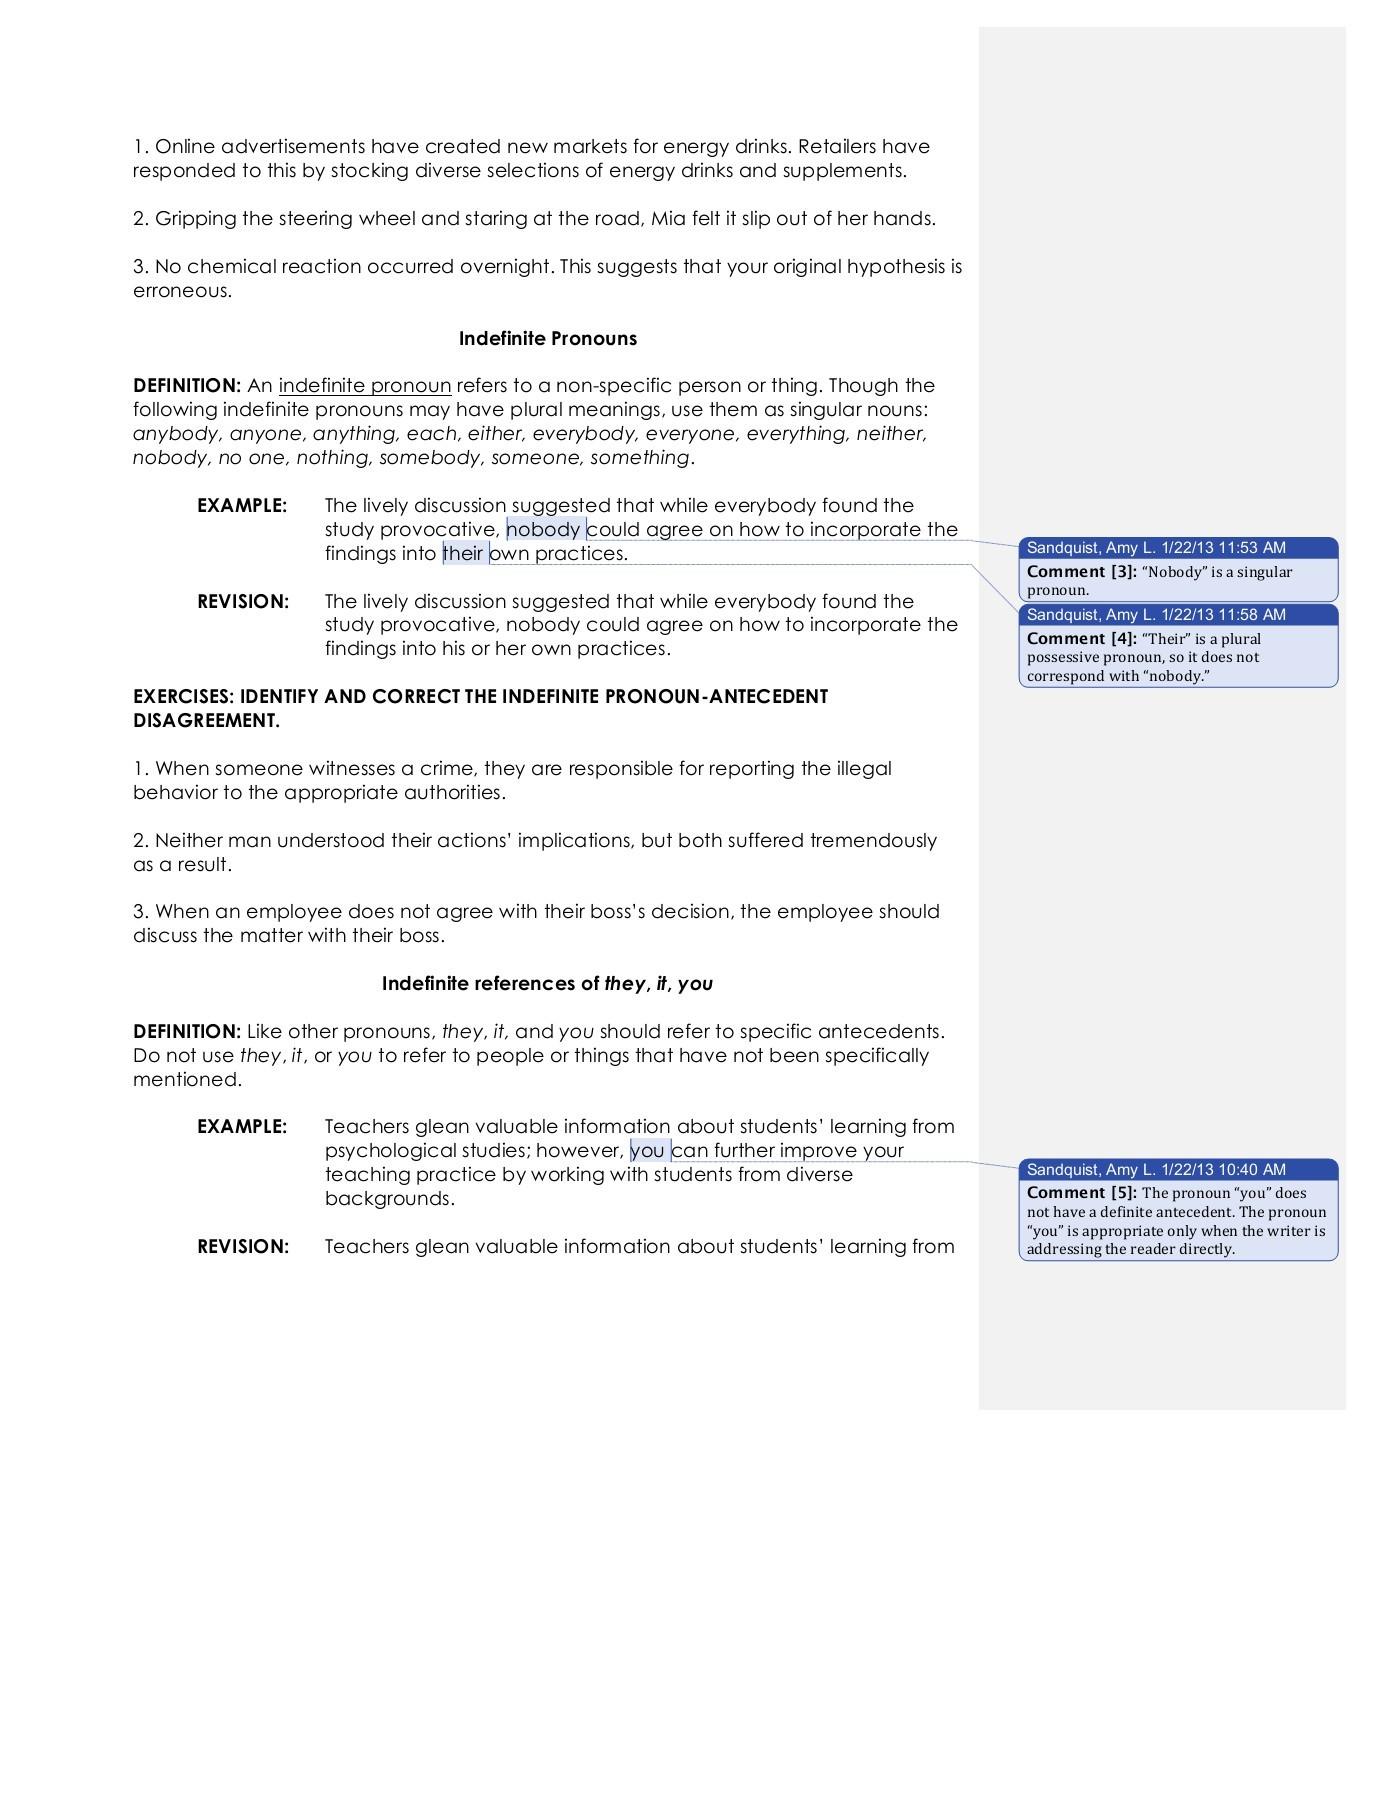 Vague Pronoun Reference Worksheet